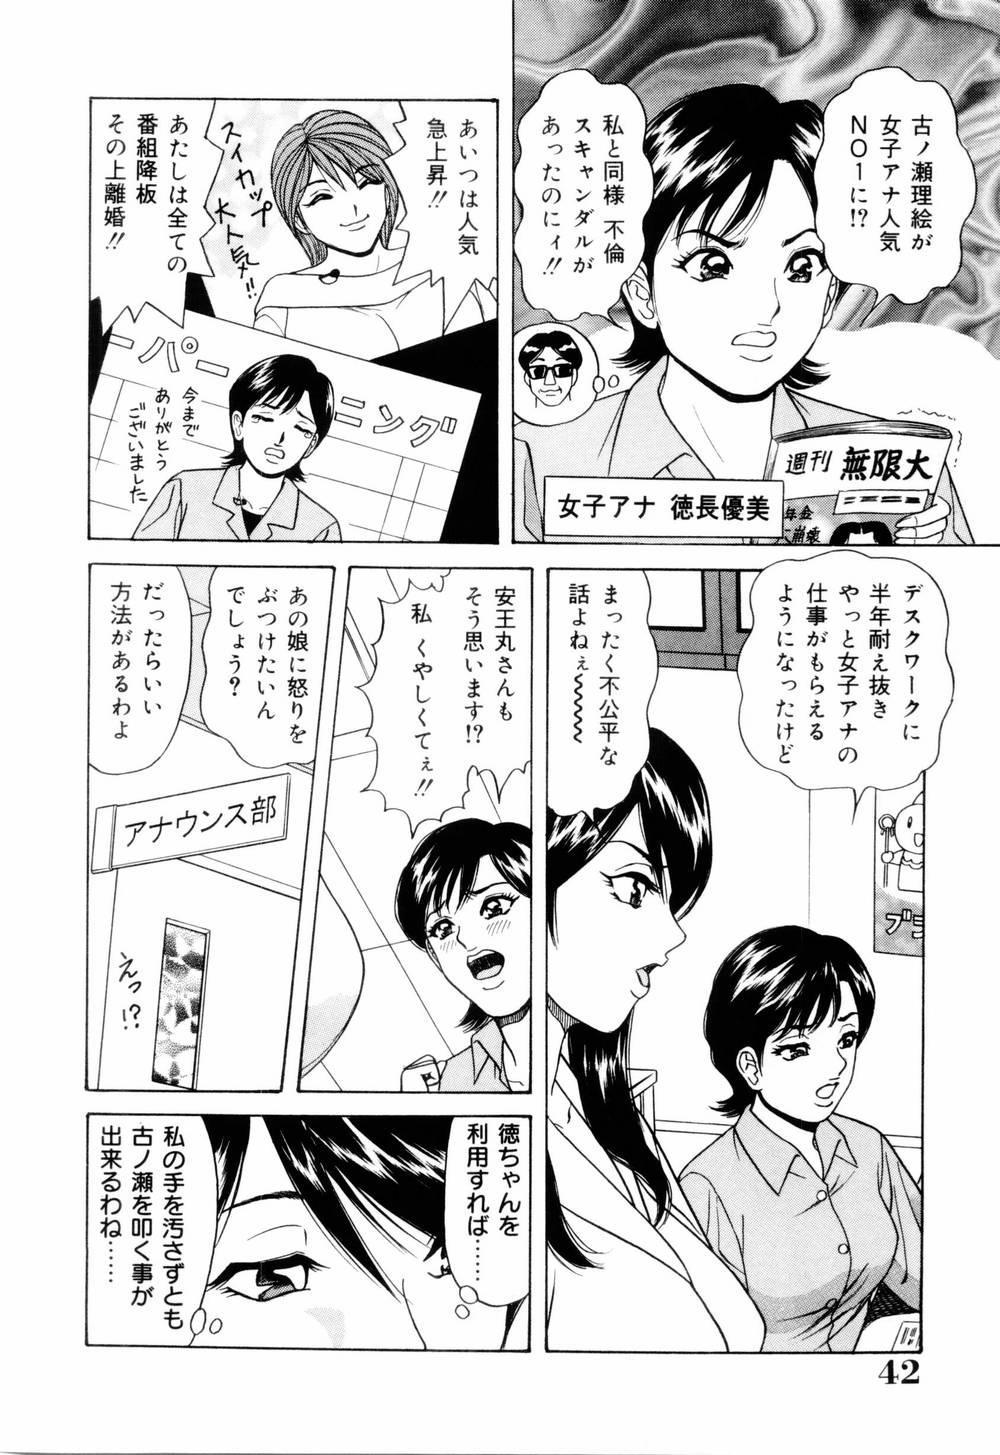 SuiCup Joshi Announcer Jikkyo Chukei Rape 45